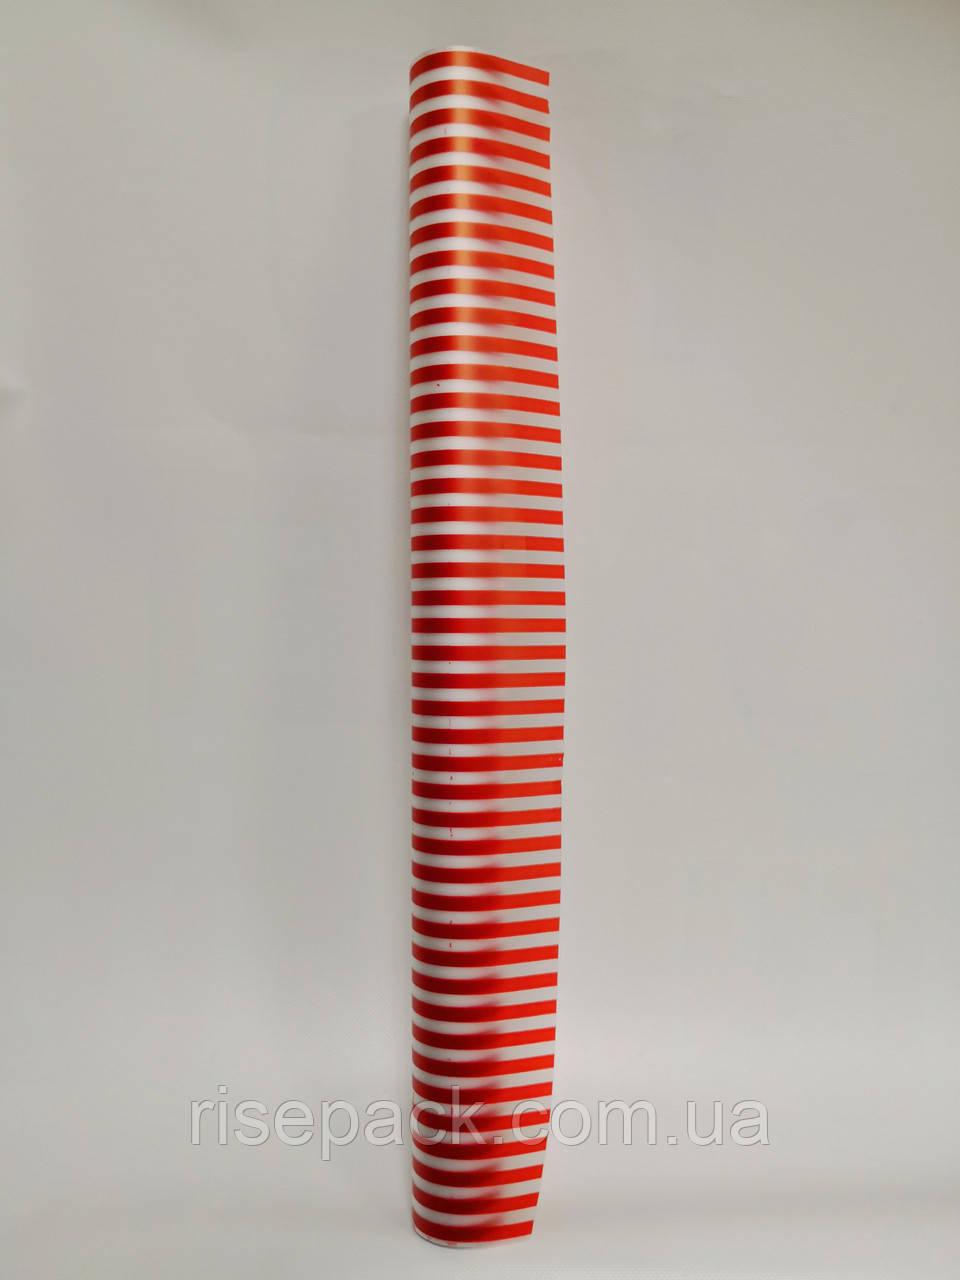 Пленка для упаковки подарков ПОЛОСА красная рулон 0,6х10м